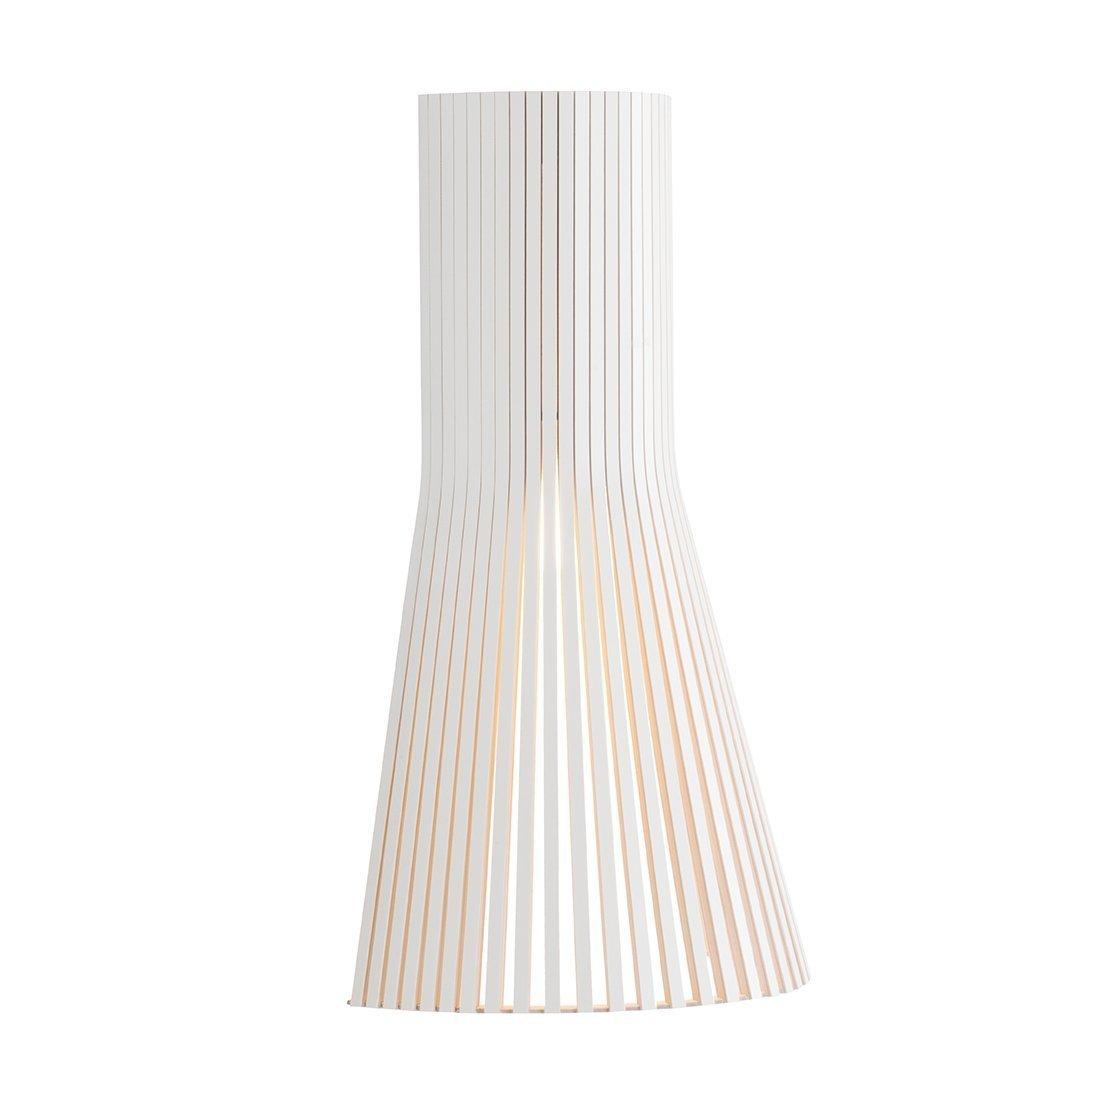 Secto Design Secto 4231 Wandlamp Wit Zonder Kabel